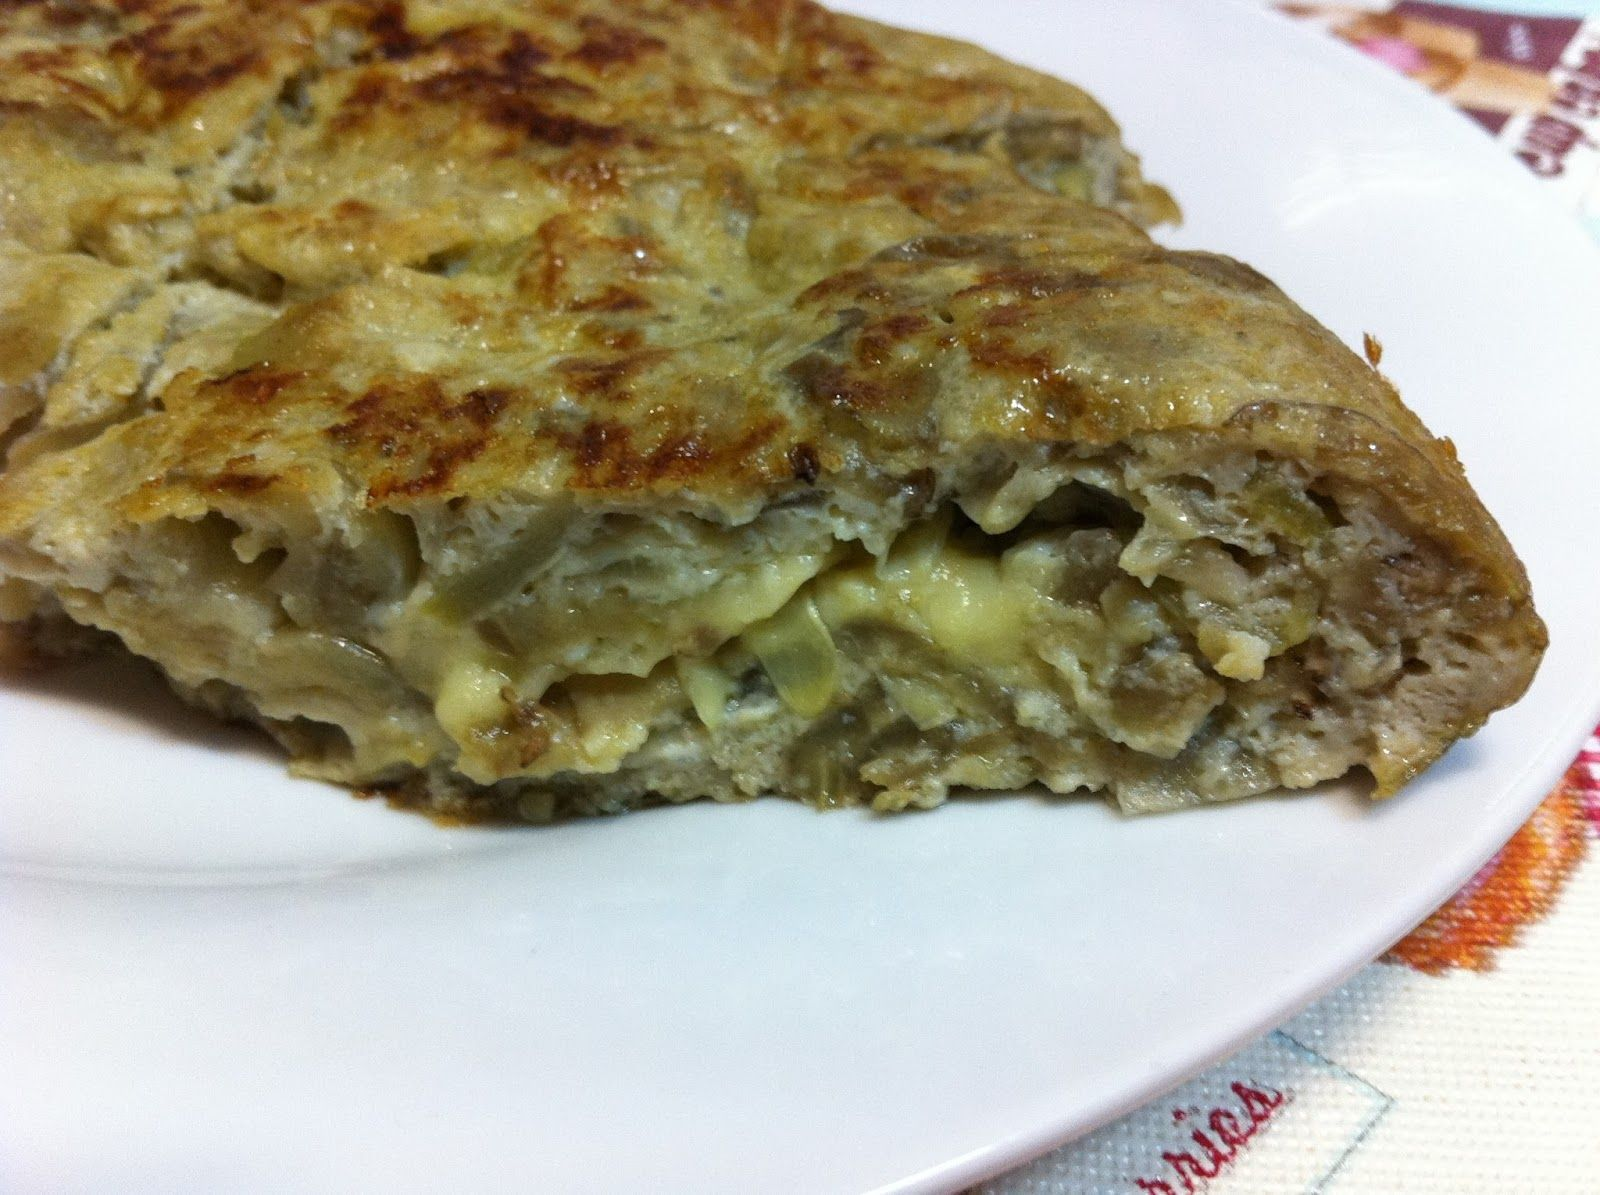 Tortilla de berenjena calabac n y cebolla blog dieta - Tortilla de calabacin y cebolla ...